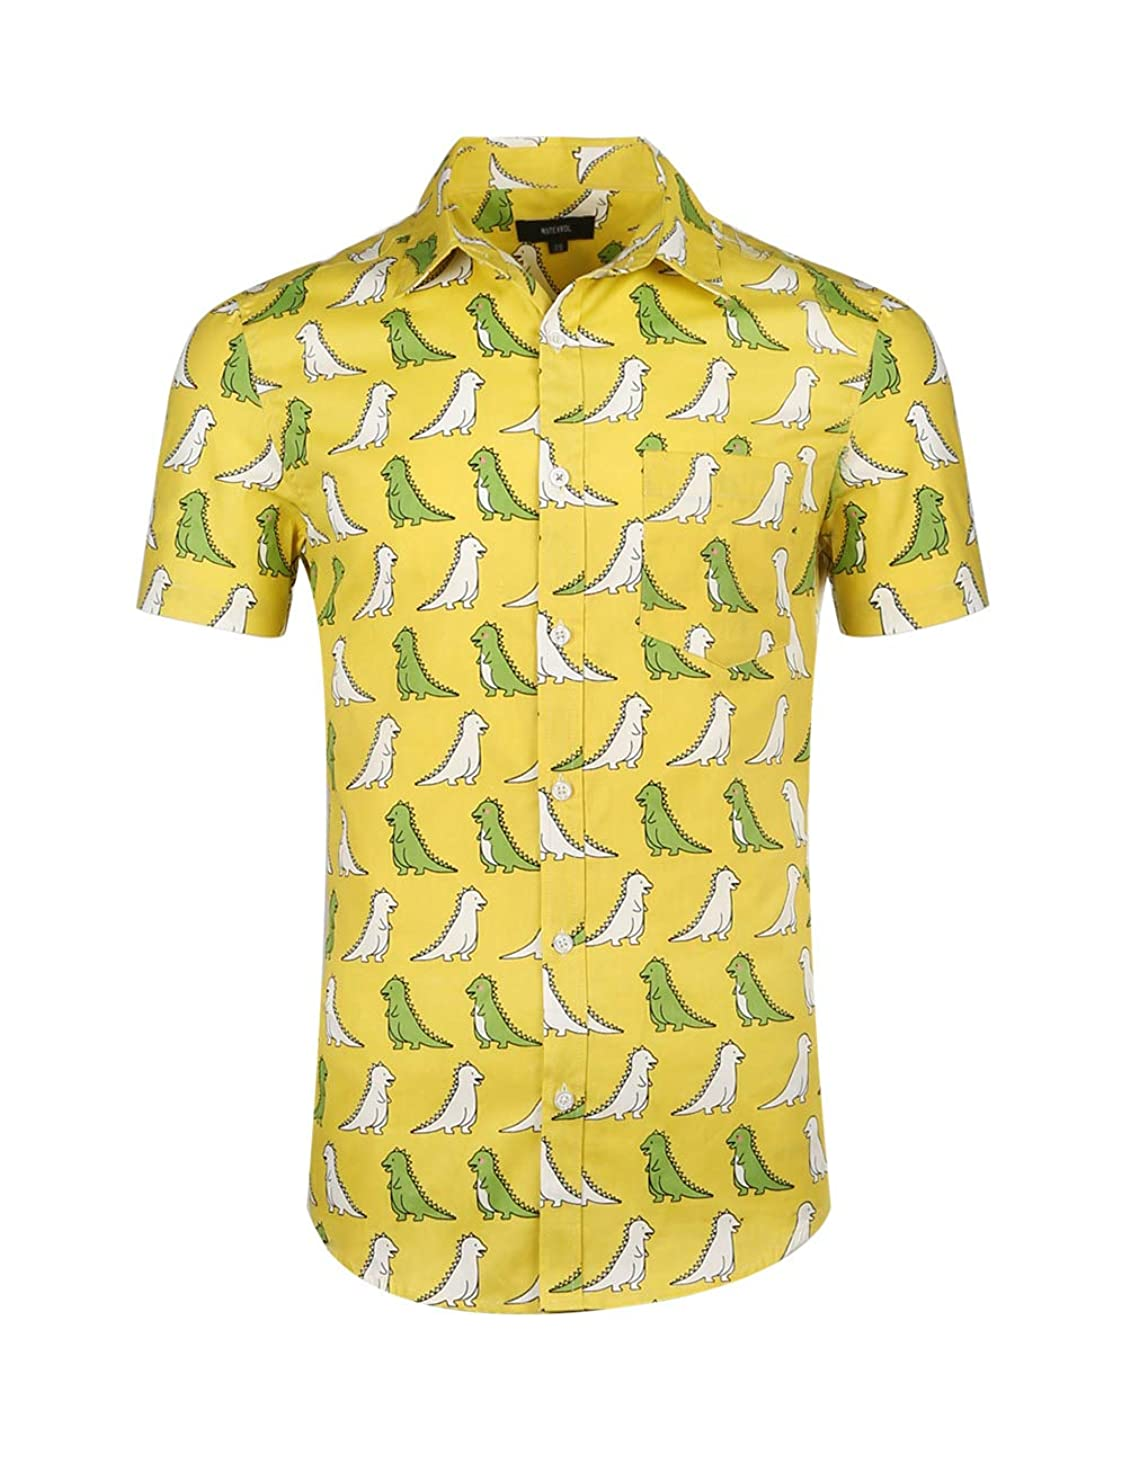 NUTEXROL Mens Hawaiian Shirts Standard-Fit Cotton/Polyester Palm Tree Printed Beach Wear